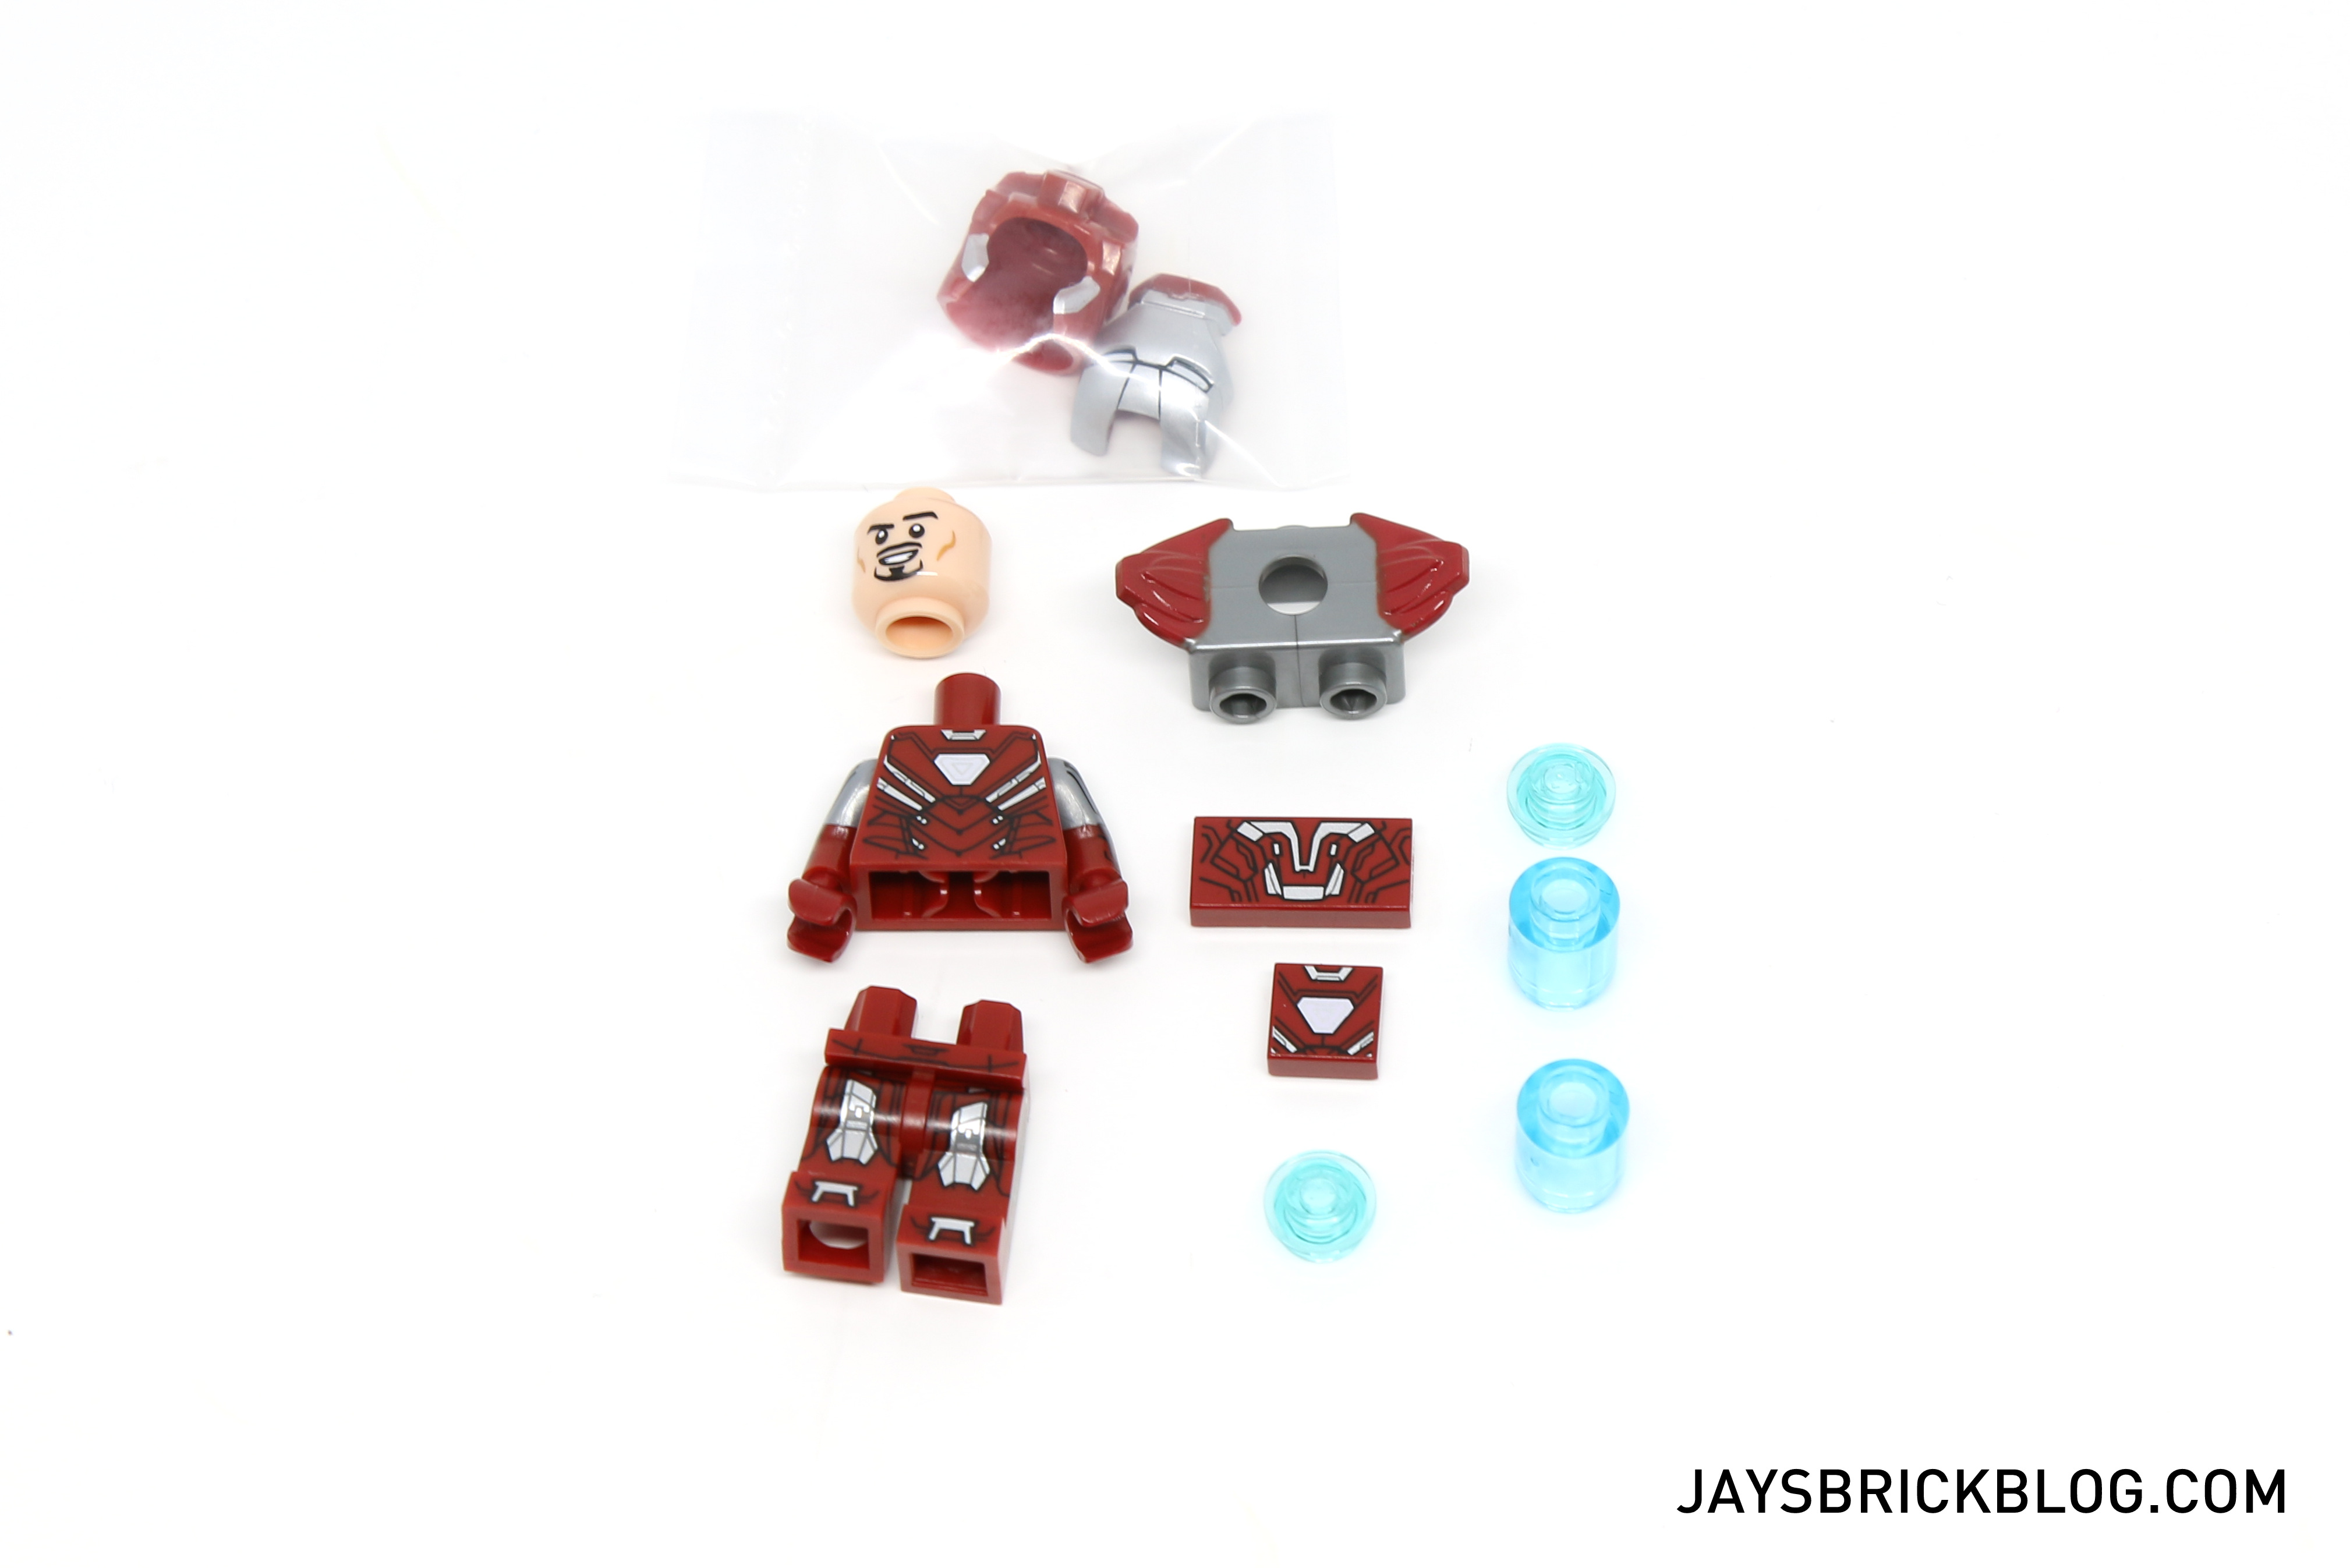 NEW LEGO SILVER CENTURION MINIFIGURE POLYBAG 5002946 MARVEL AVENGERS IRON MAN